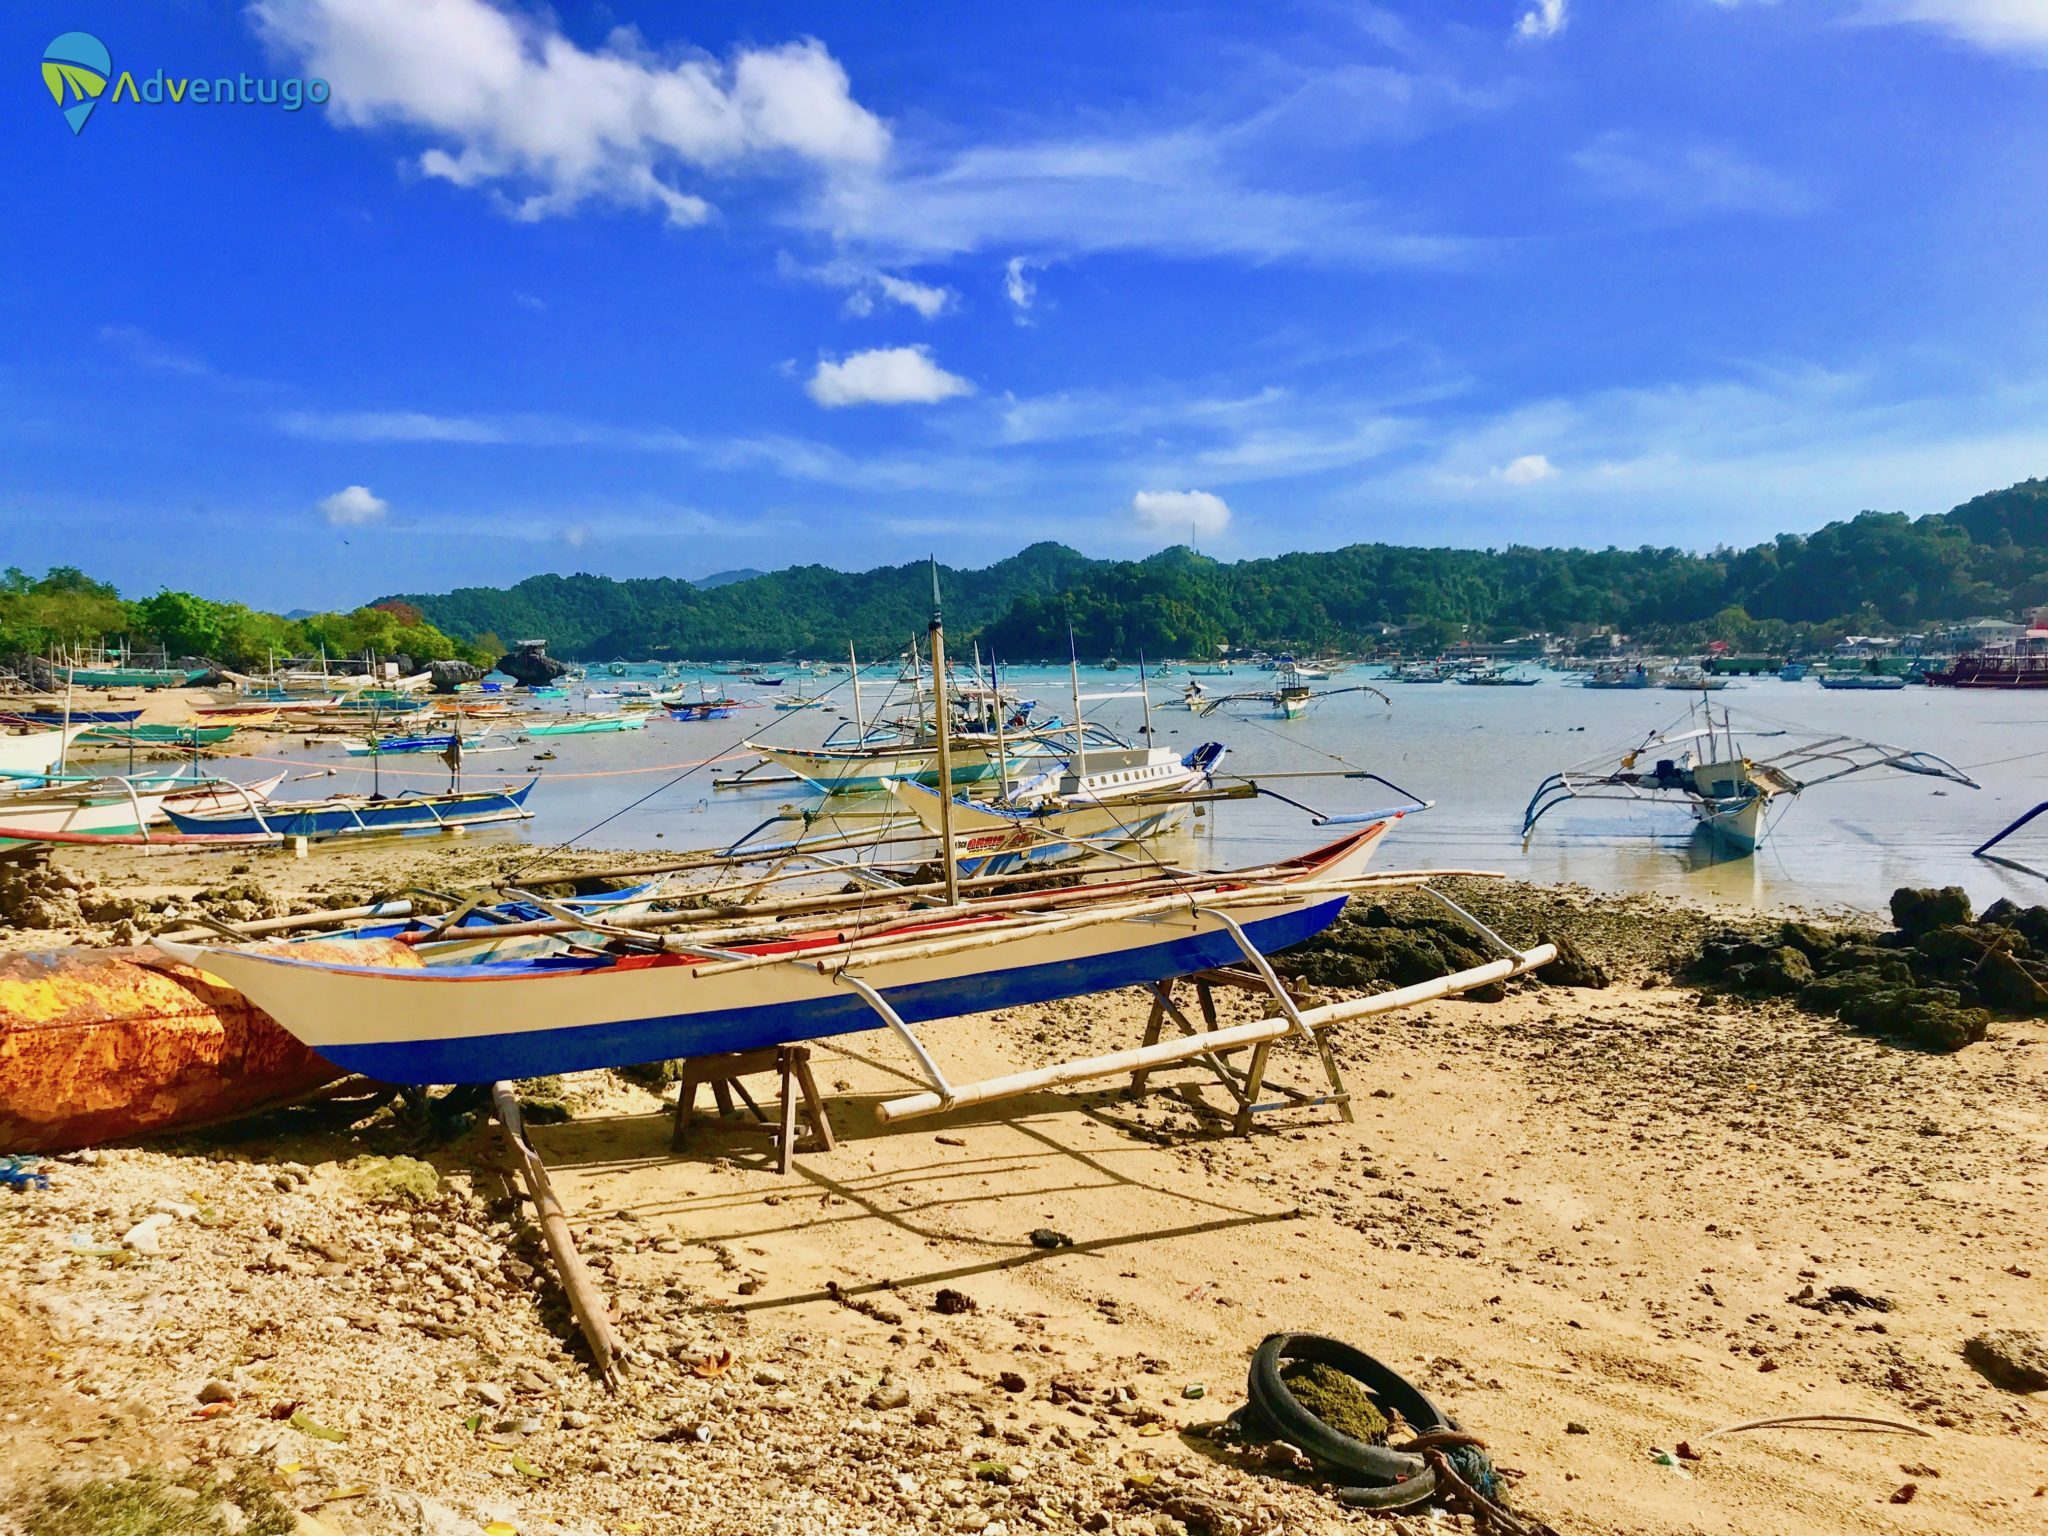 El Nido Longtail Boats, Philippines